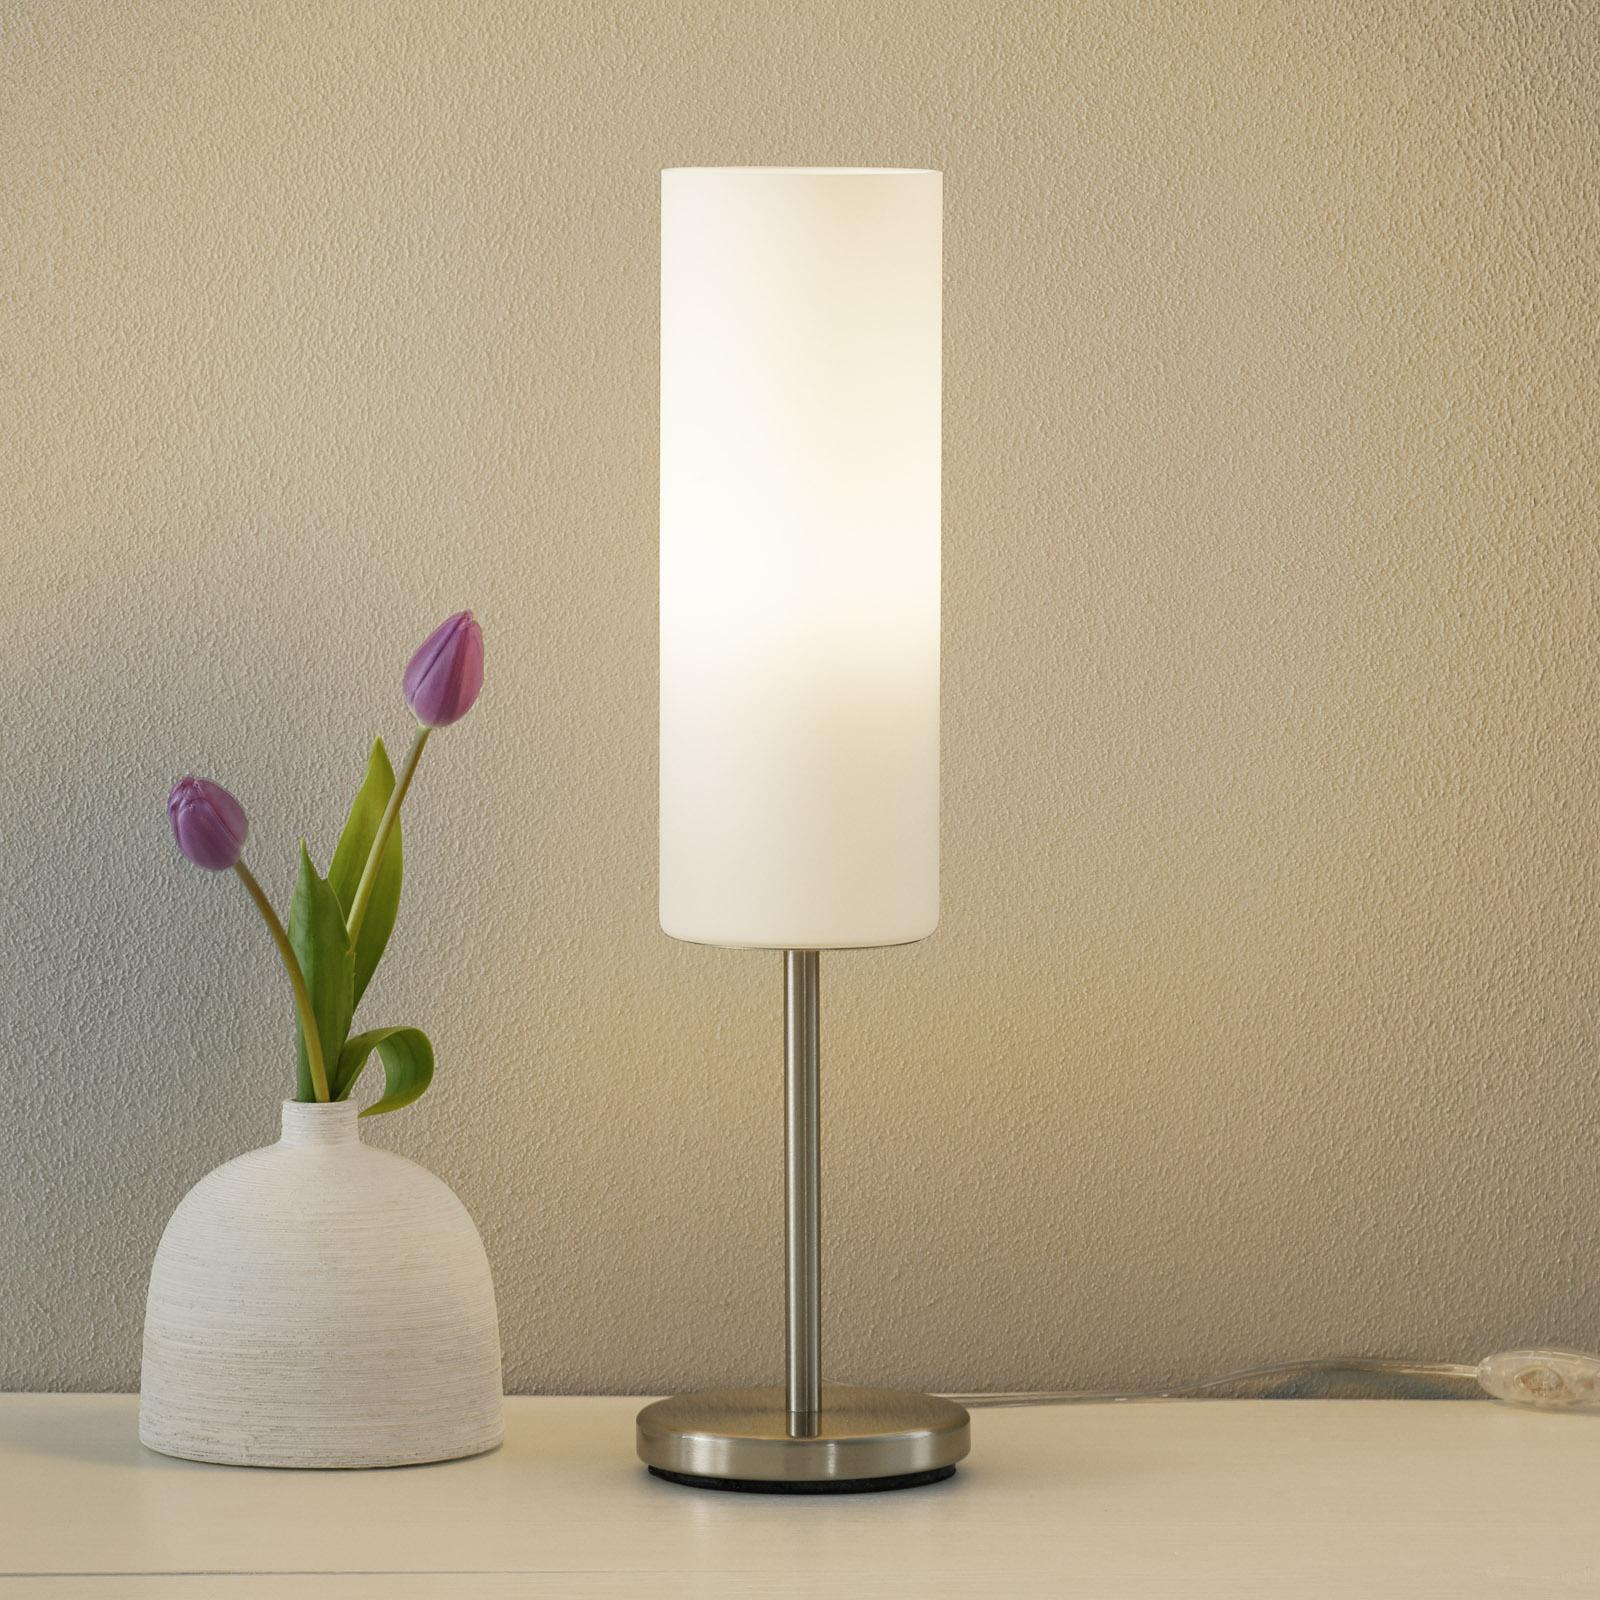 Charmig vit bordslampa TROY